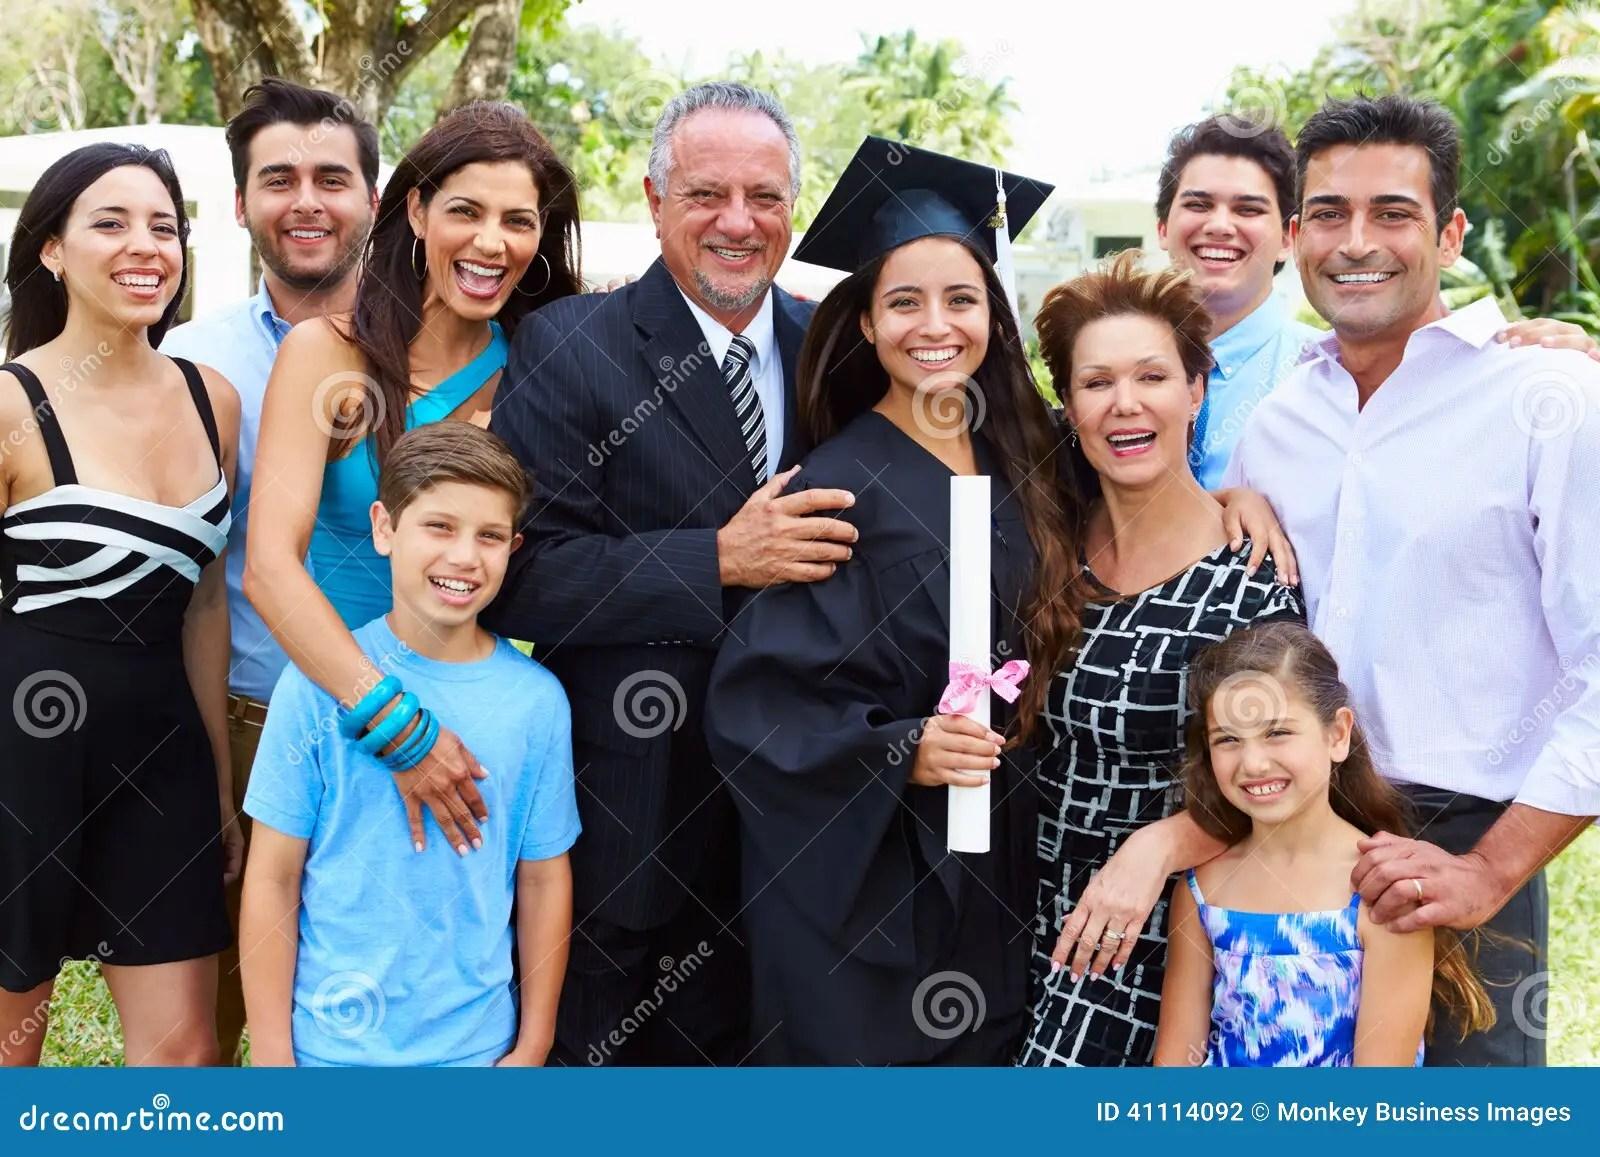 Hispanic Student And Family Celebrating Graduation Stock